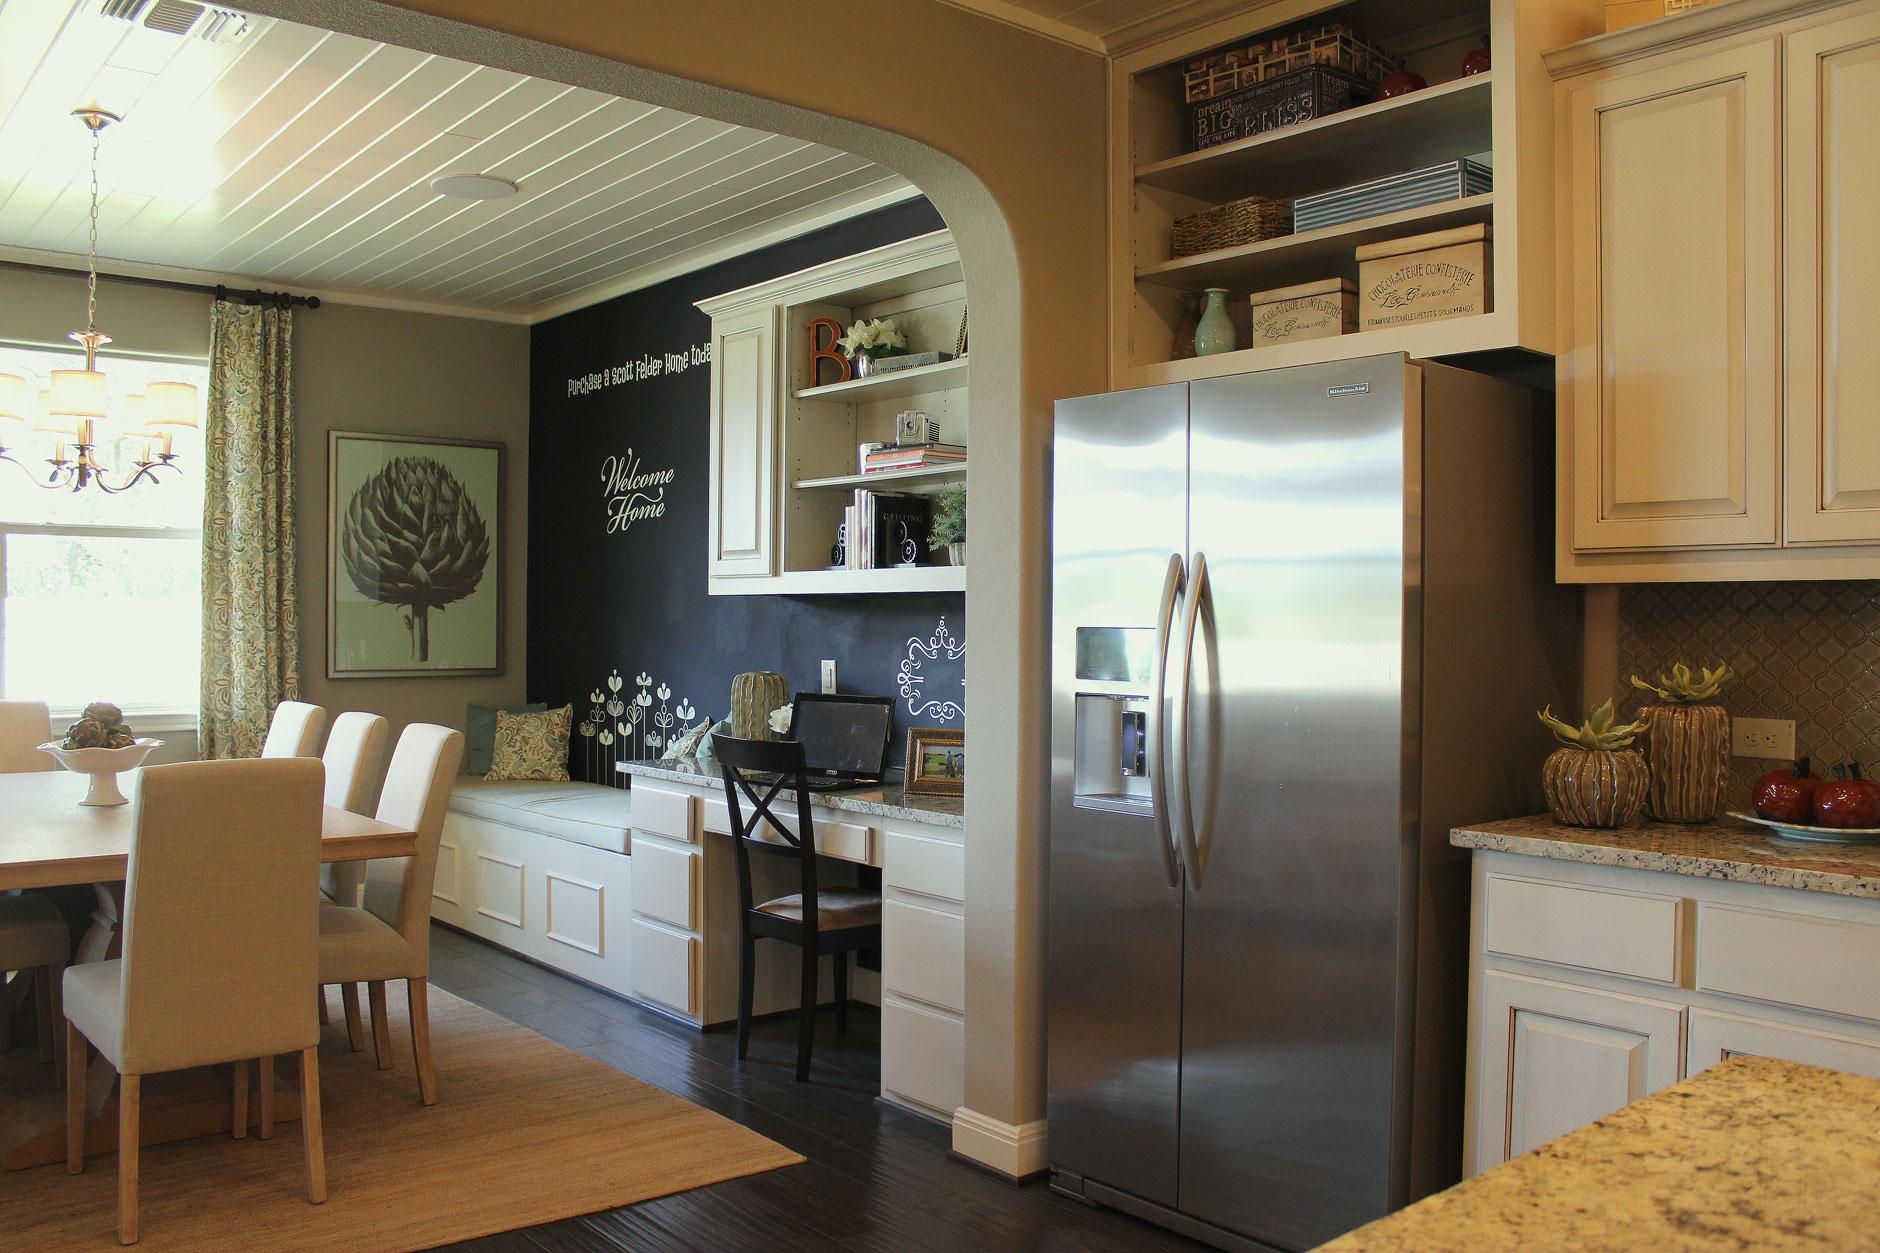 Kitchen 49 Desk - Burrows Cabinets - central Texas builder-direct